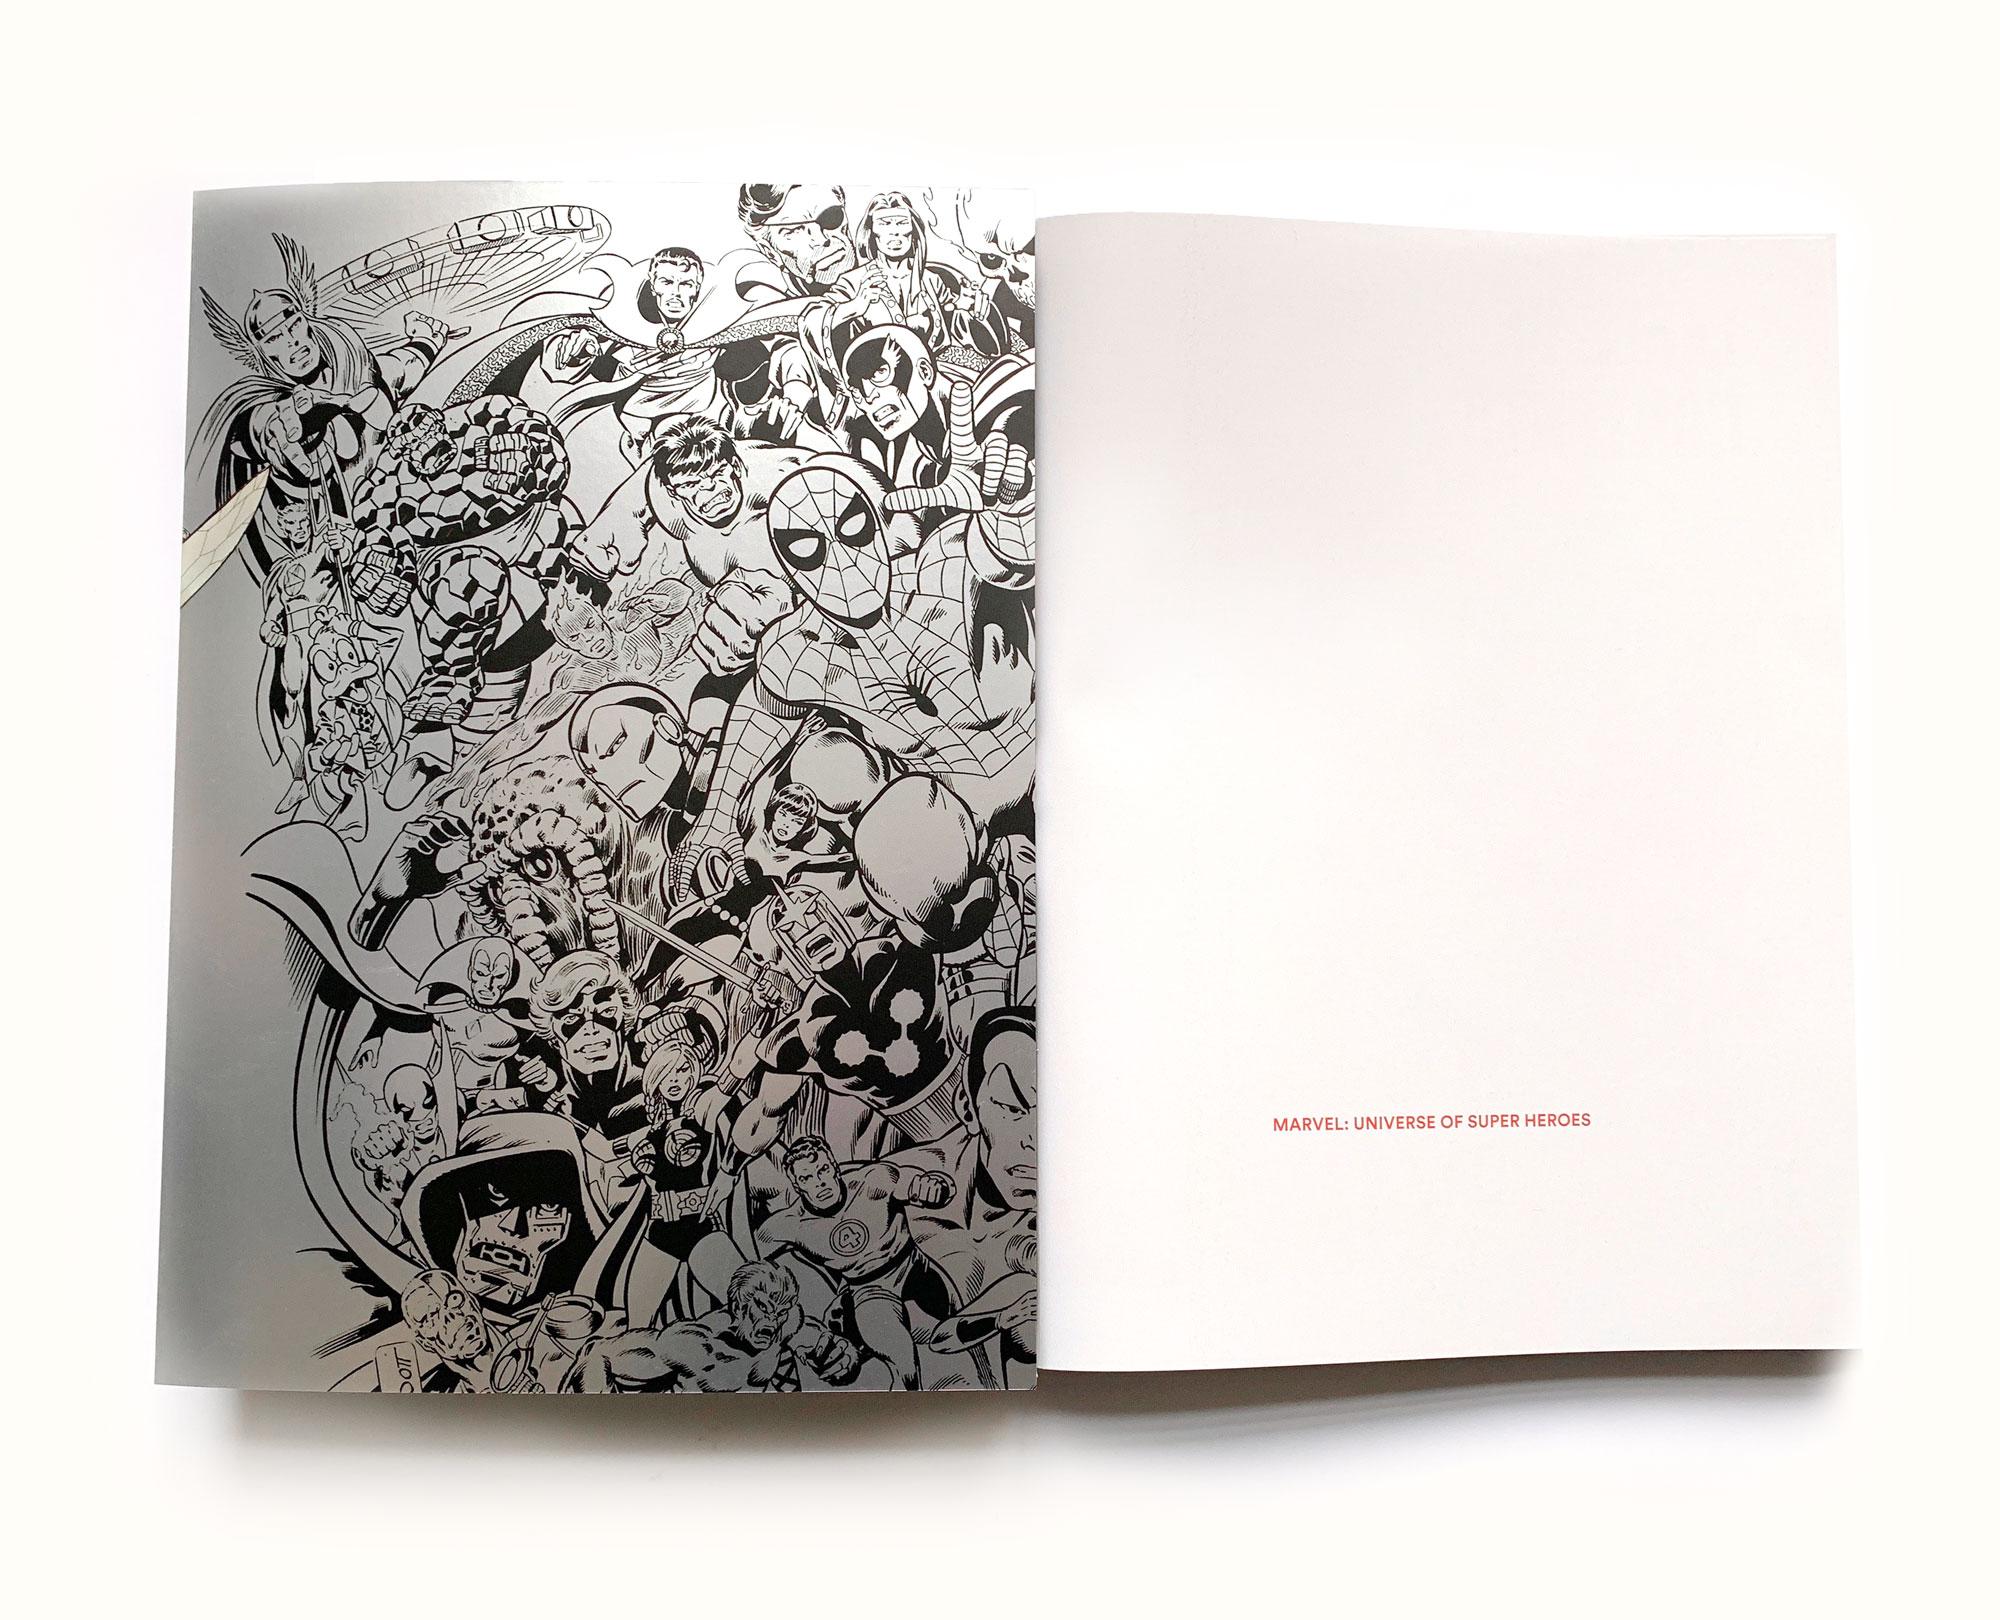 Marvel-Universe-of-Super-Heroes-Book-Silver-Balgavy.jpg